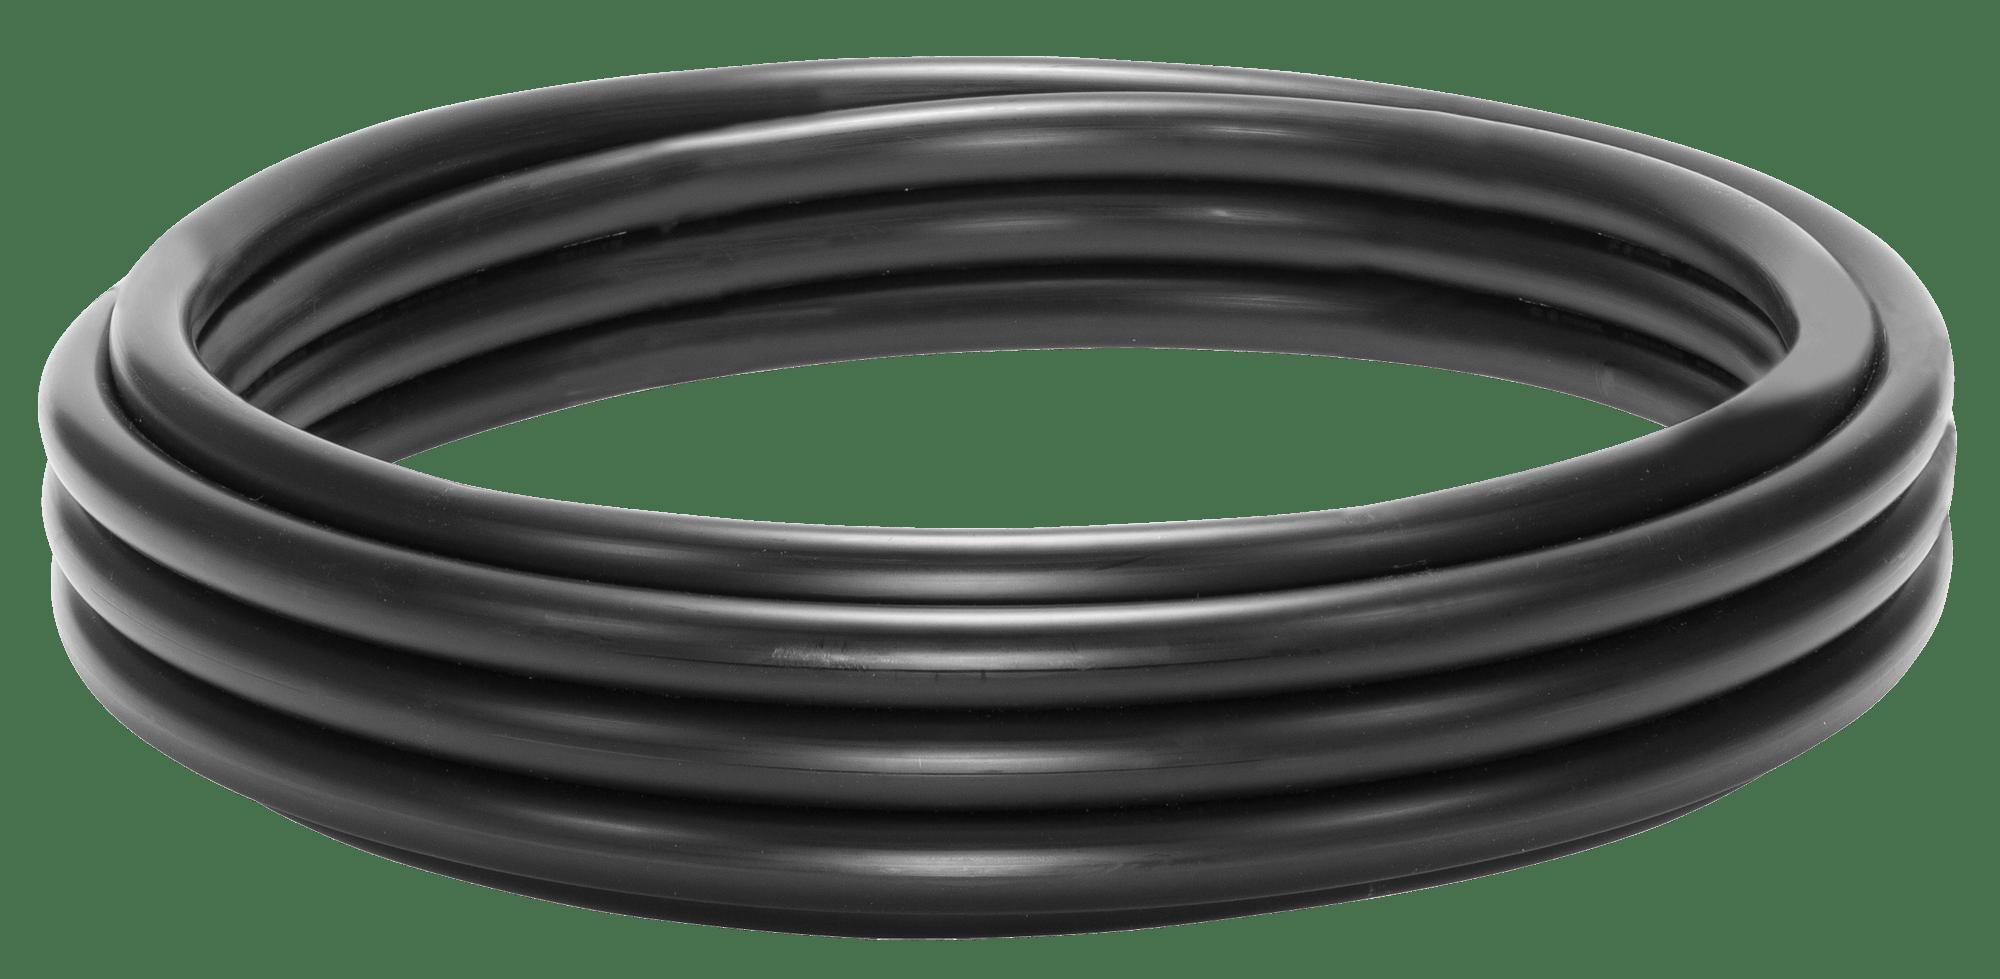 2771 Gardena Té 25 mm Pipeline